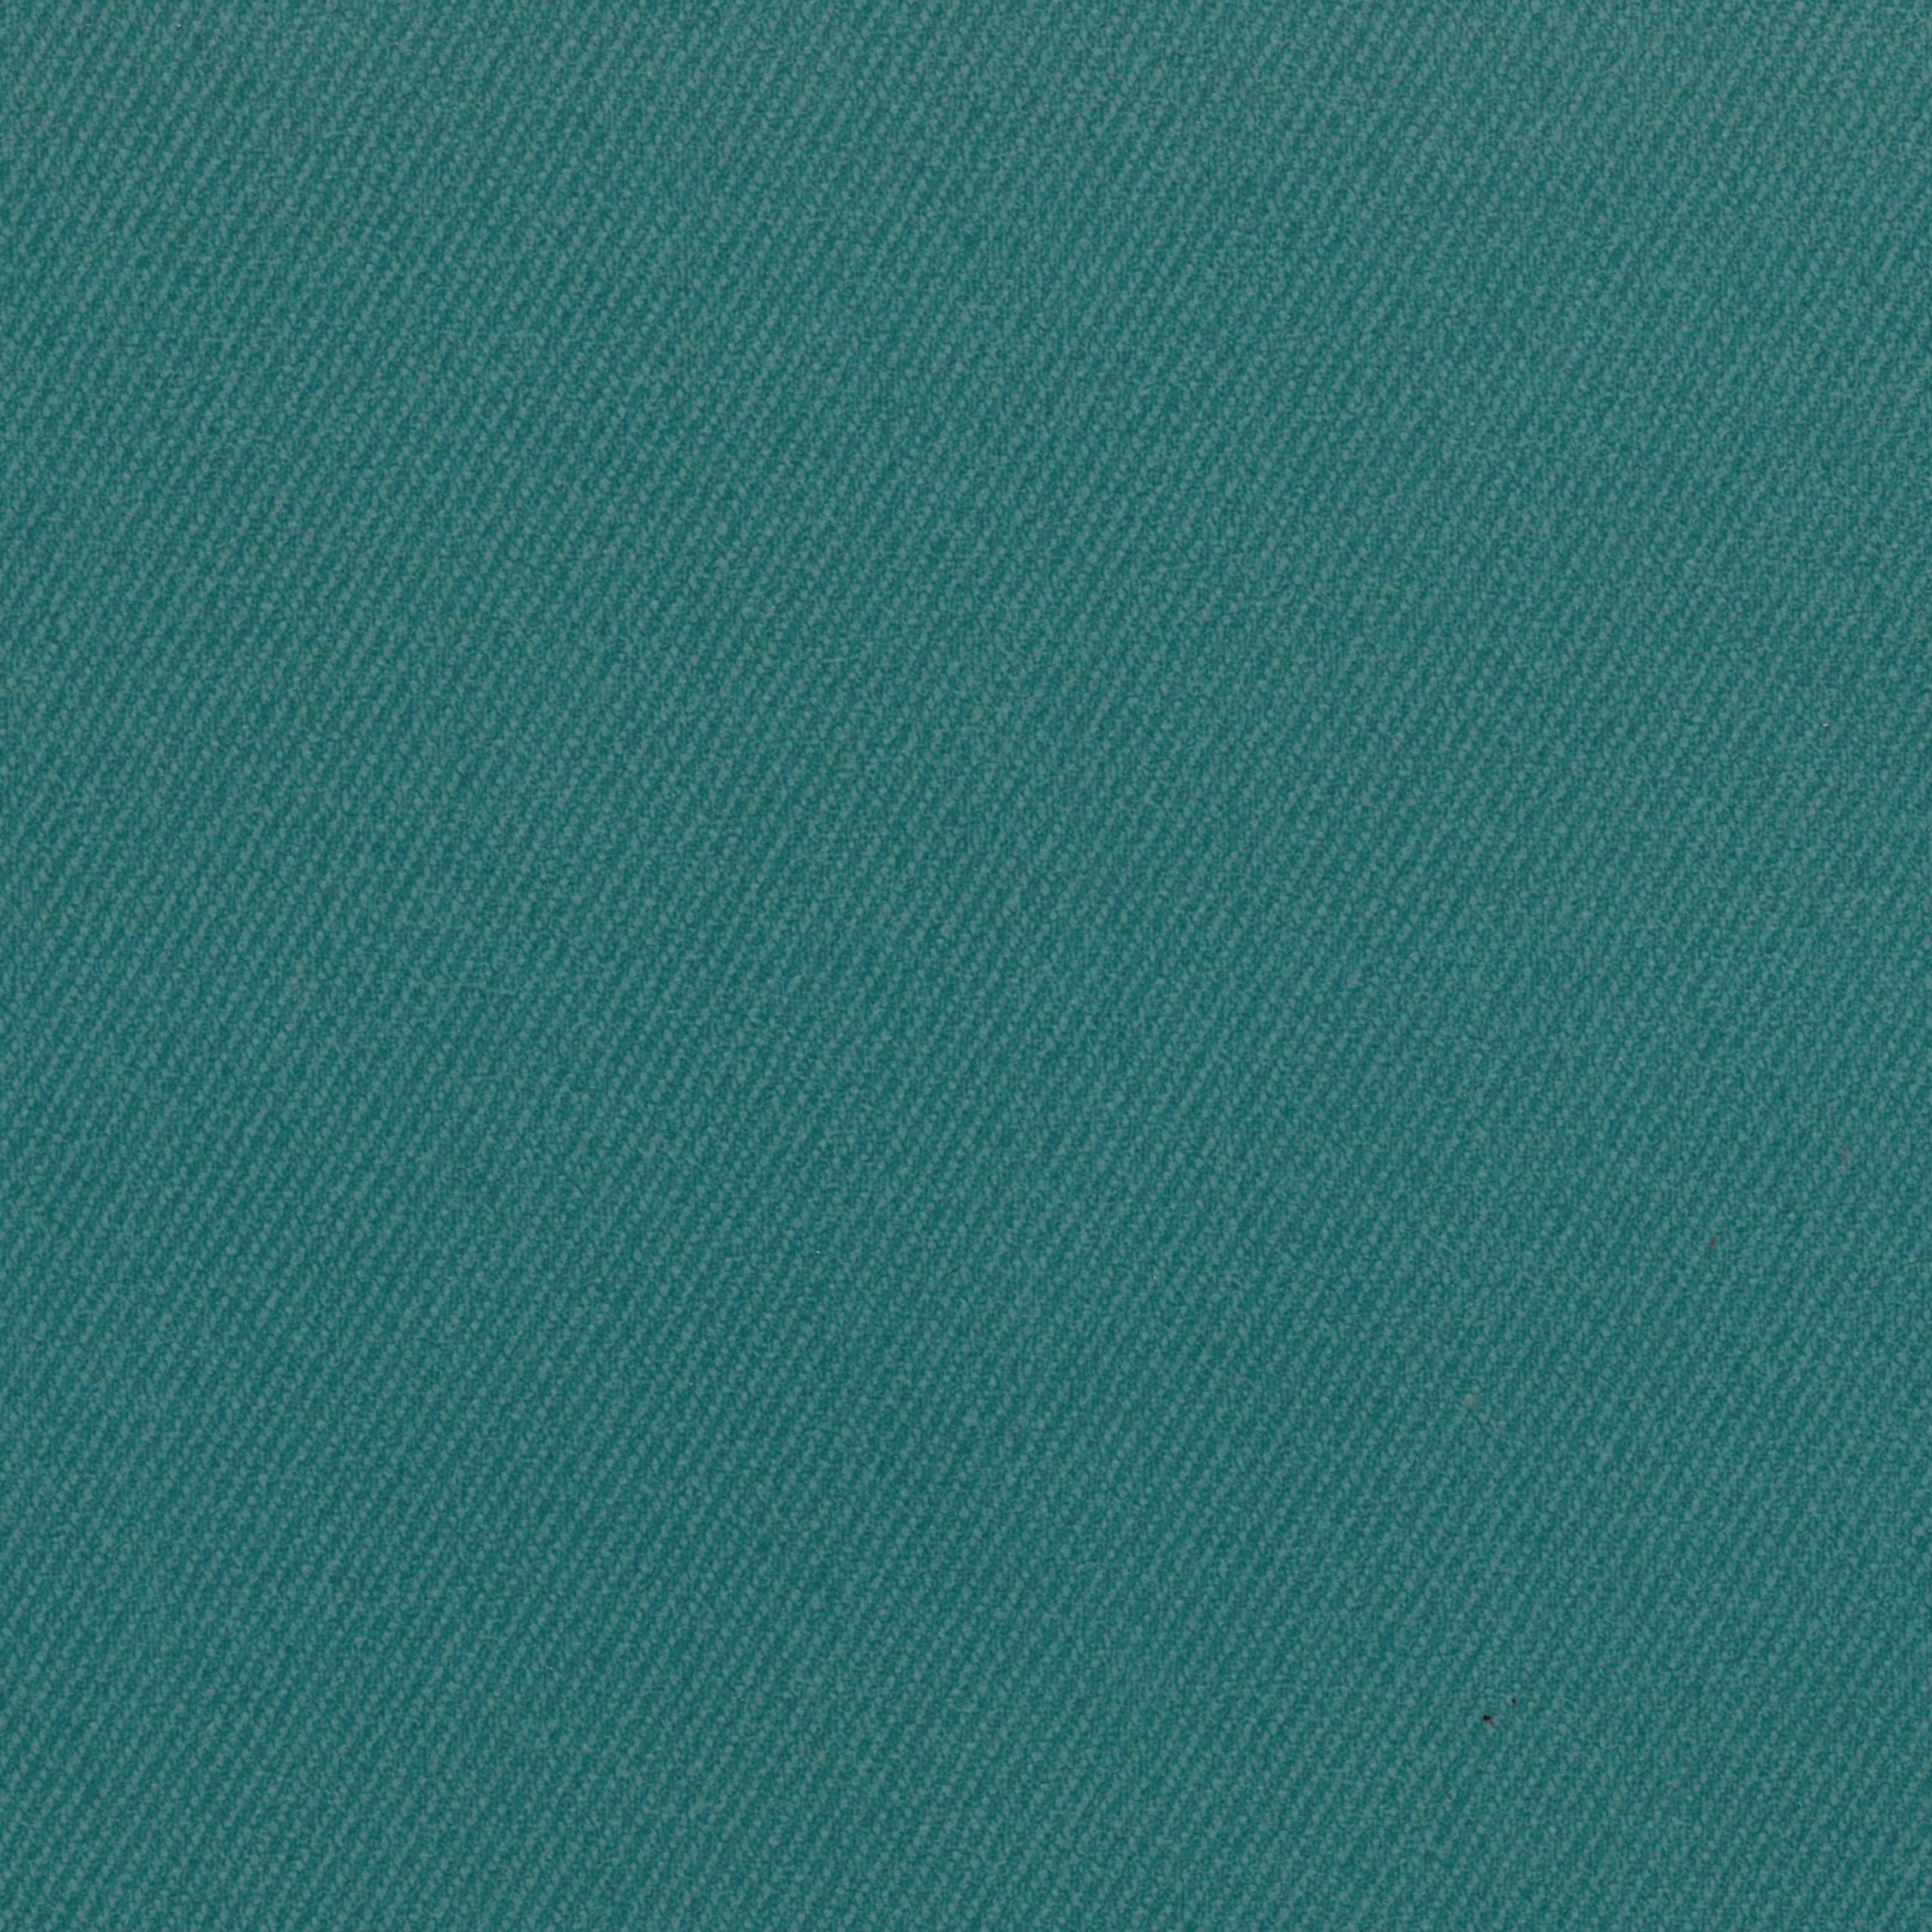 Bakero Turquoise